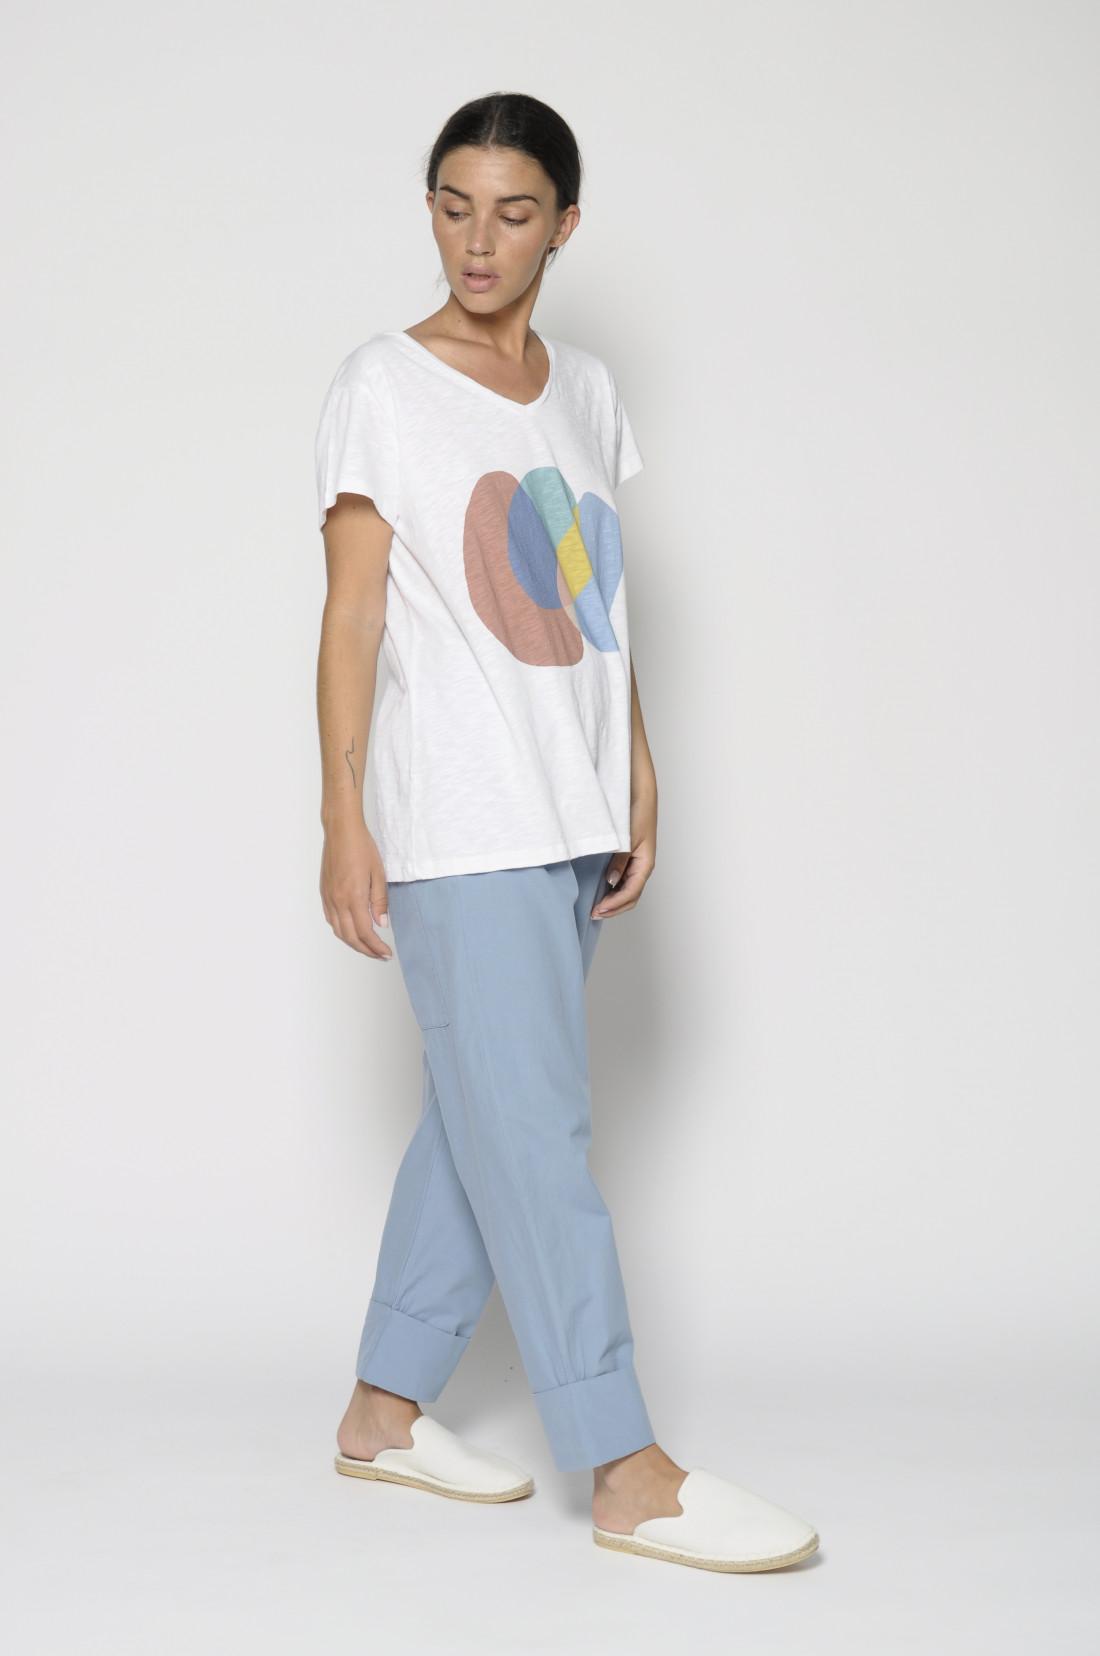 Camiseta manga corta, cuello pico, 100% algodón